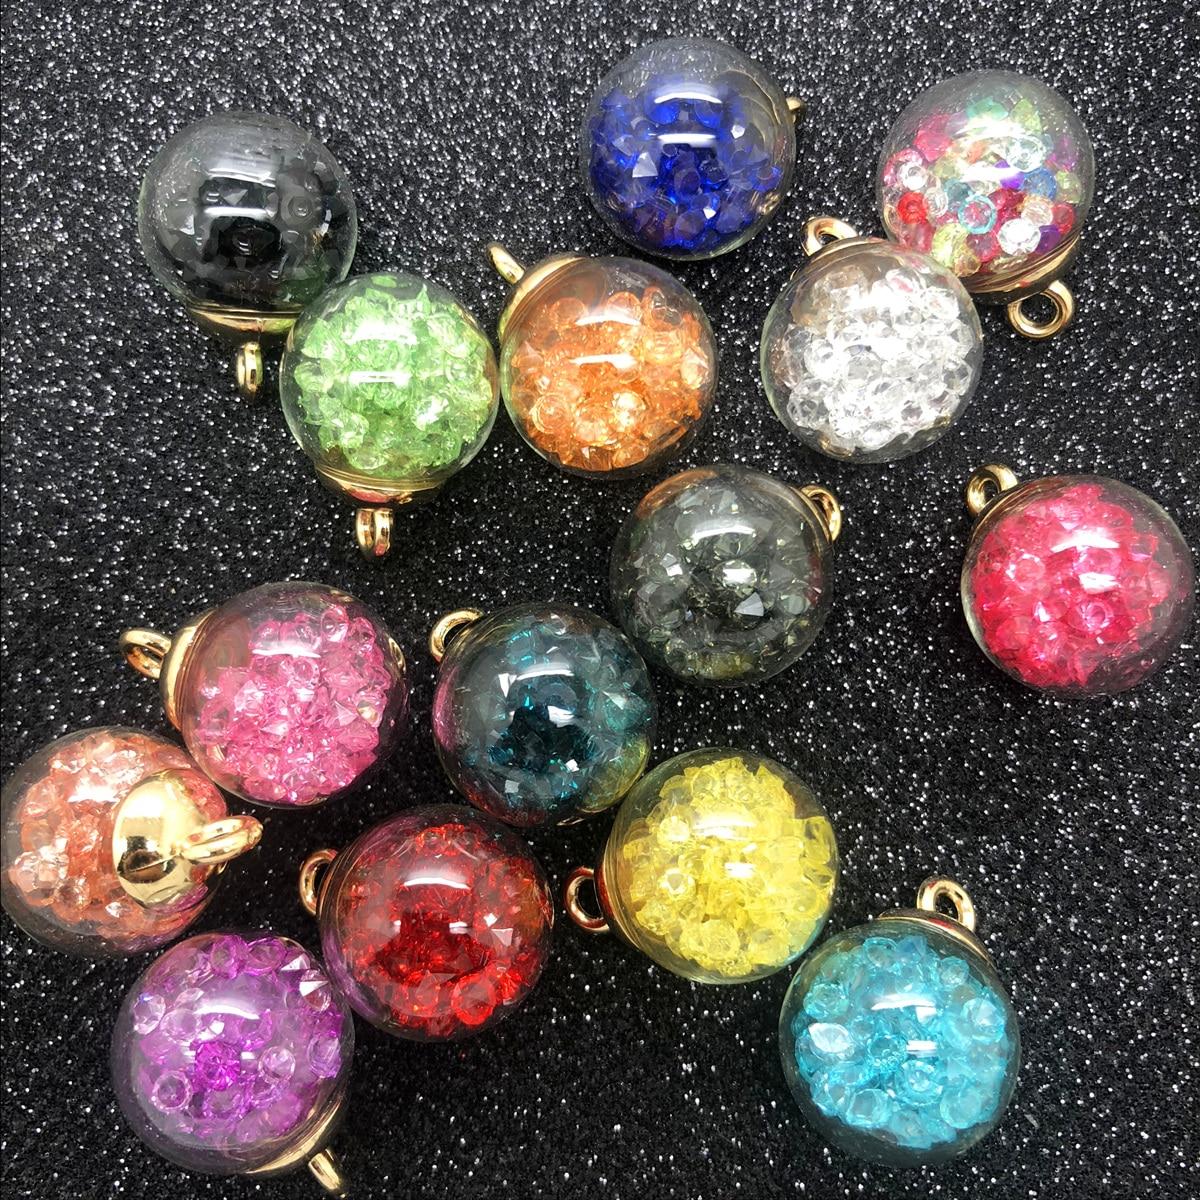 NEW 10PCS 16MM Mini Glass Bottles with Beads Pendant Ornaments Jewelry Making